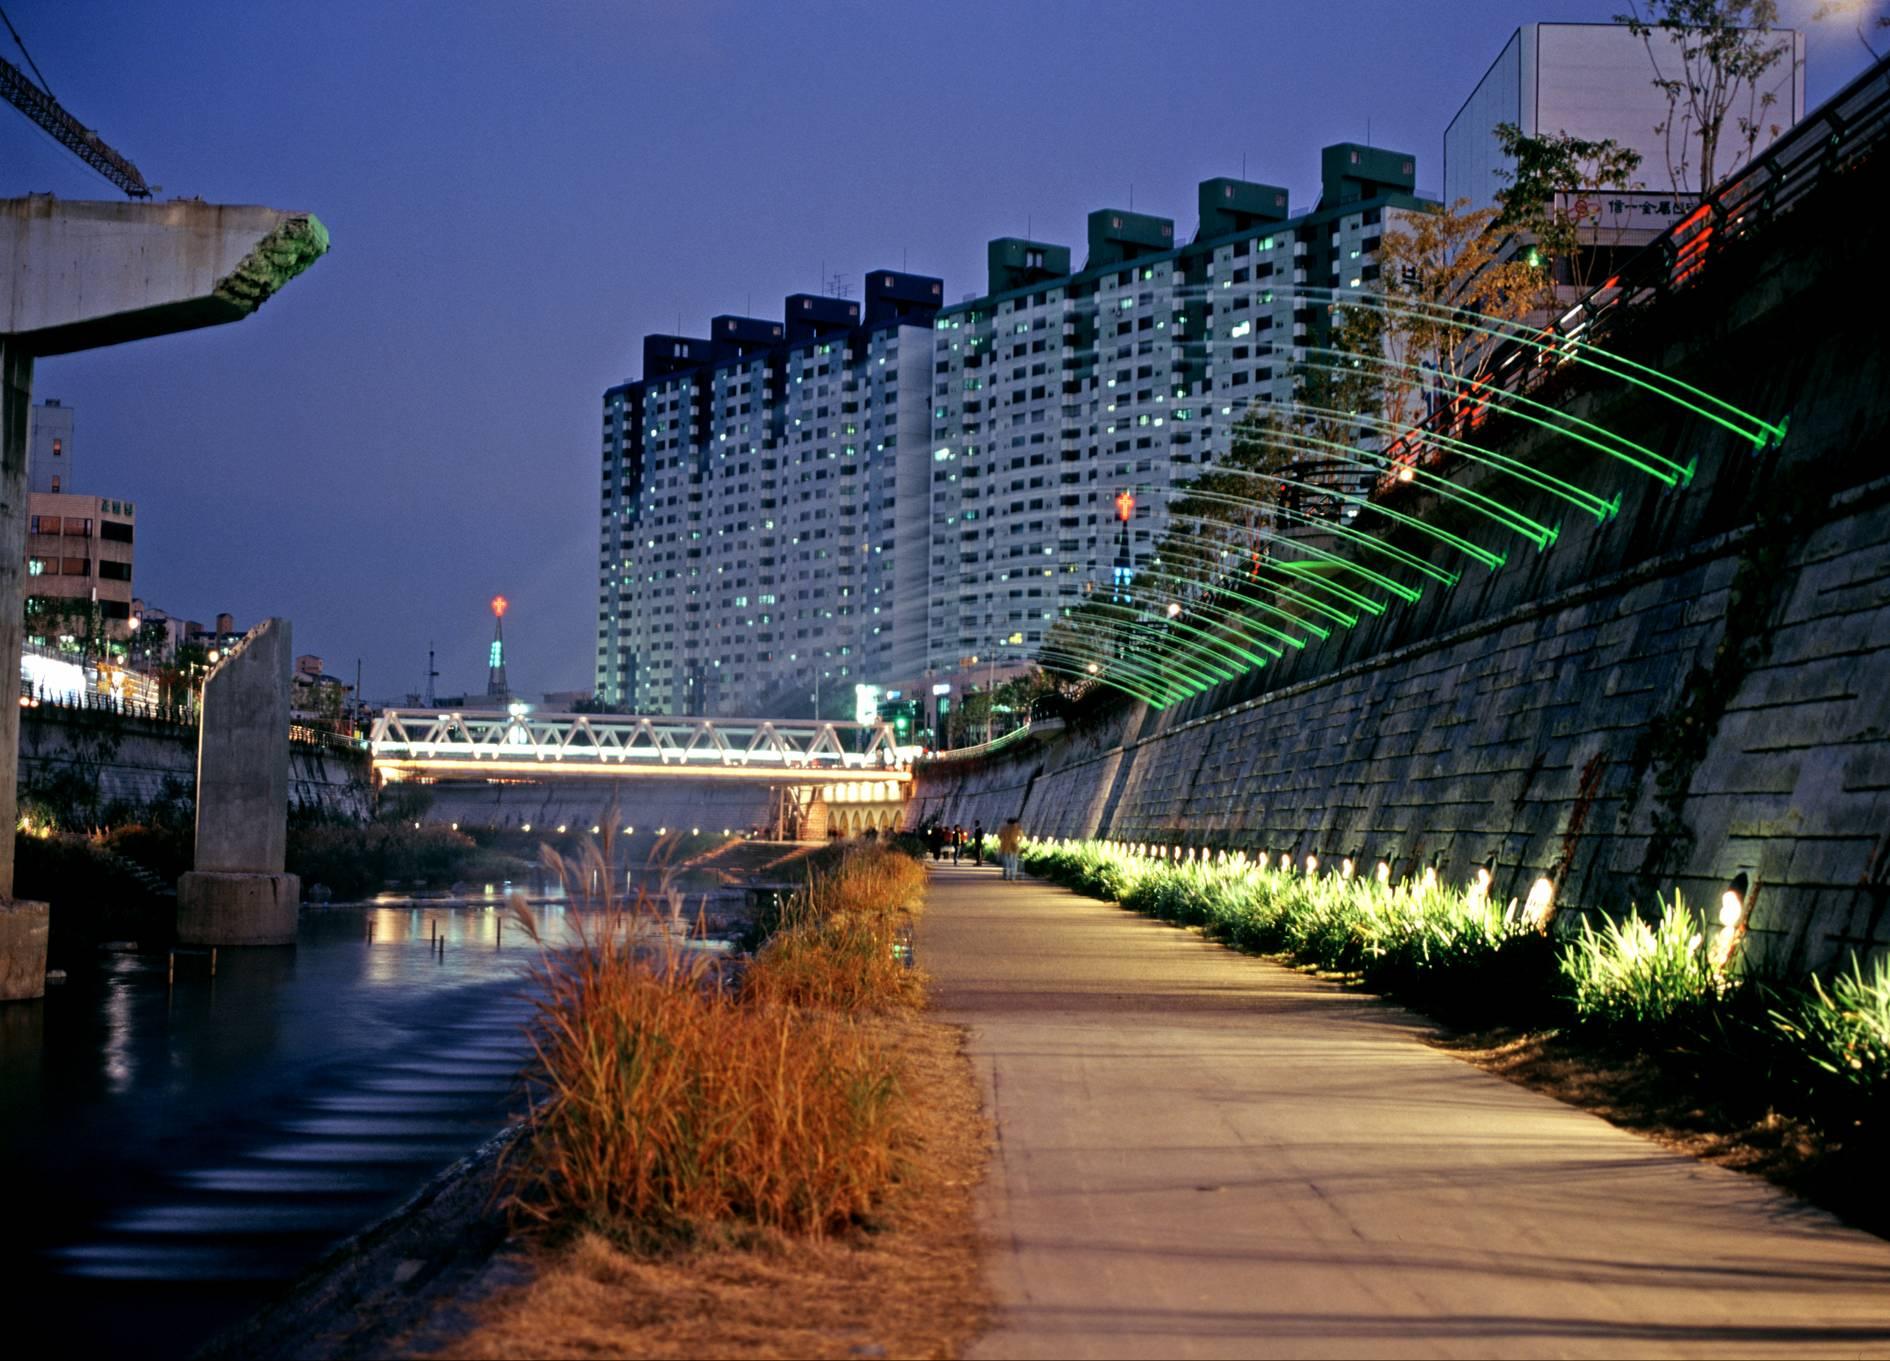 Seoul South Korea  city pictures gallery : Seoul, South Korea